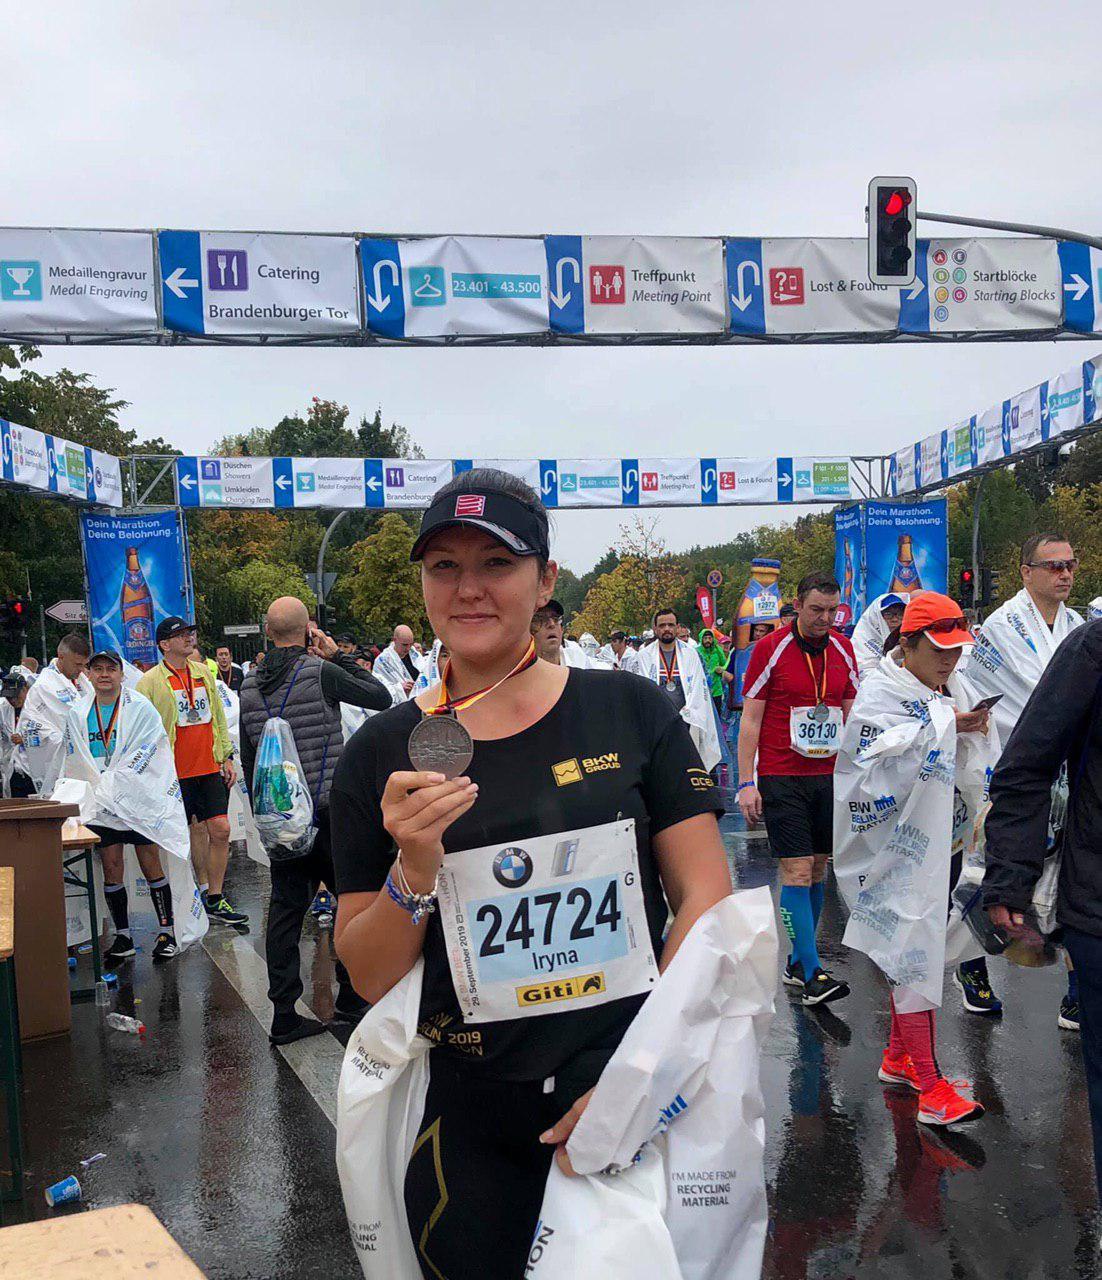 Ирина Касьяненко, директор «Океан Инвест», после марафона в Берлине